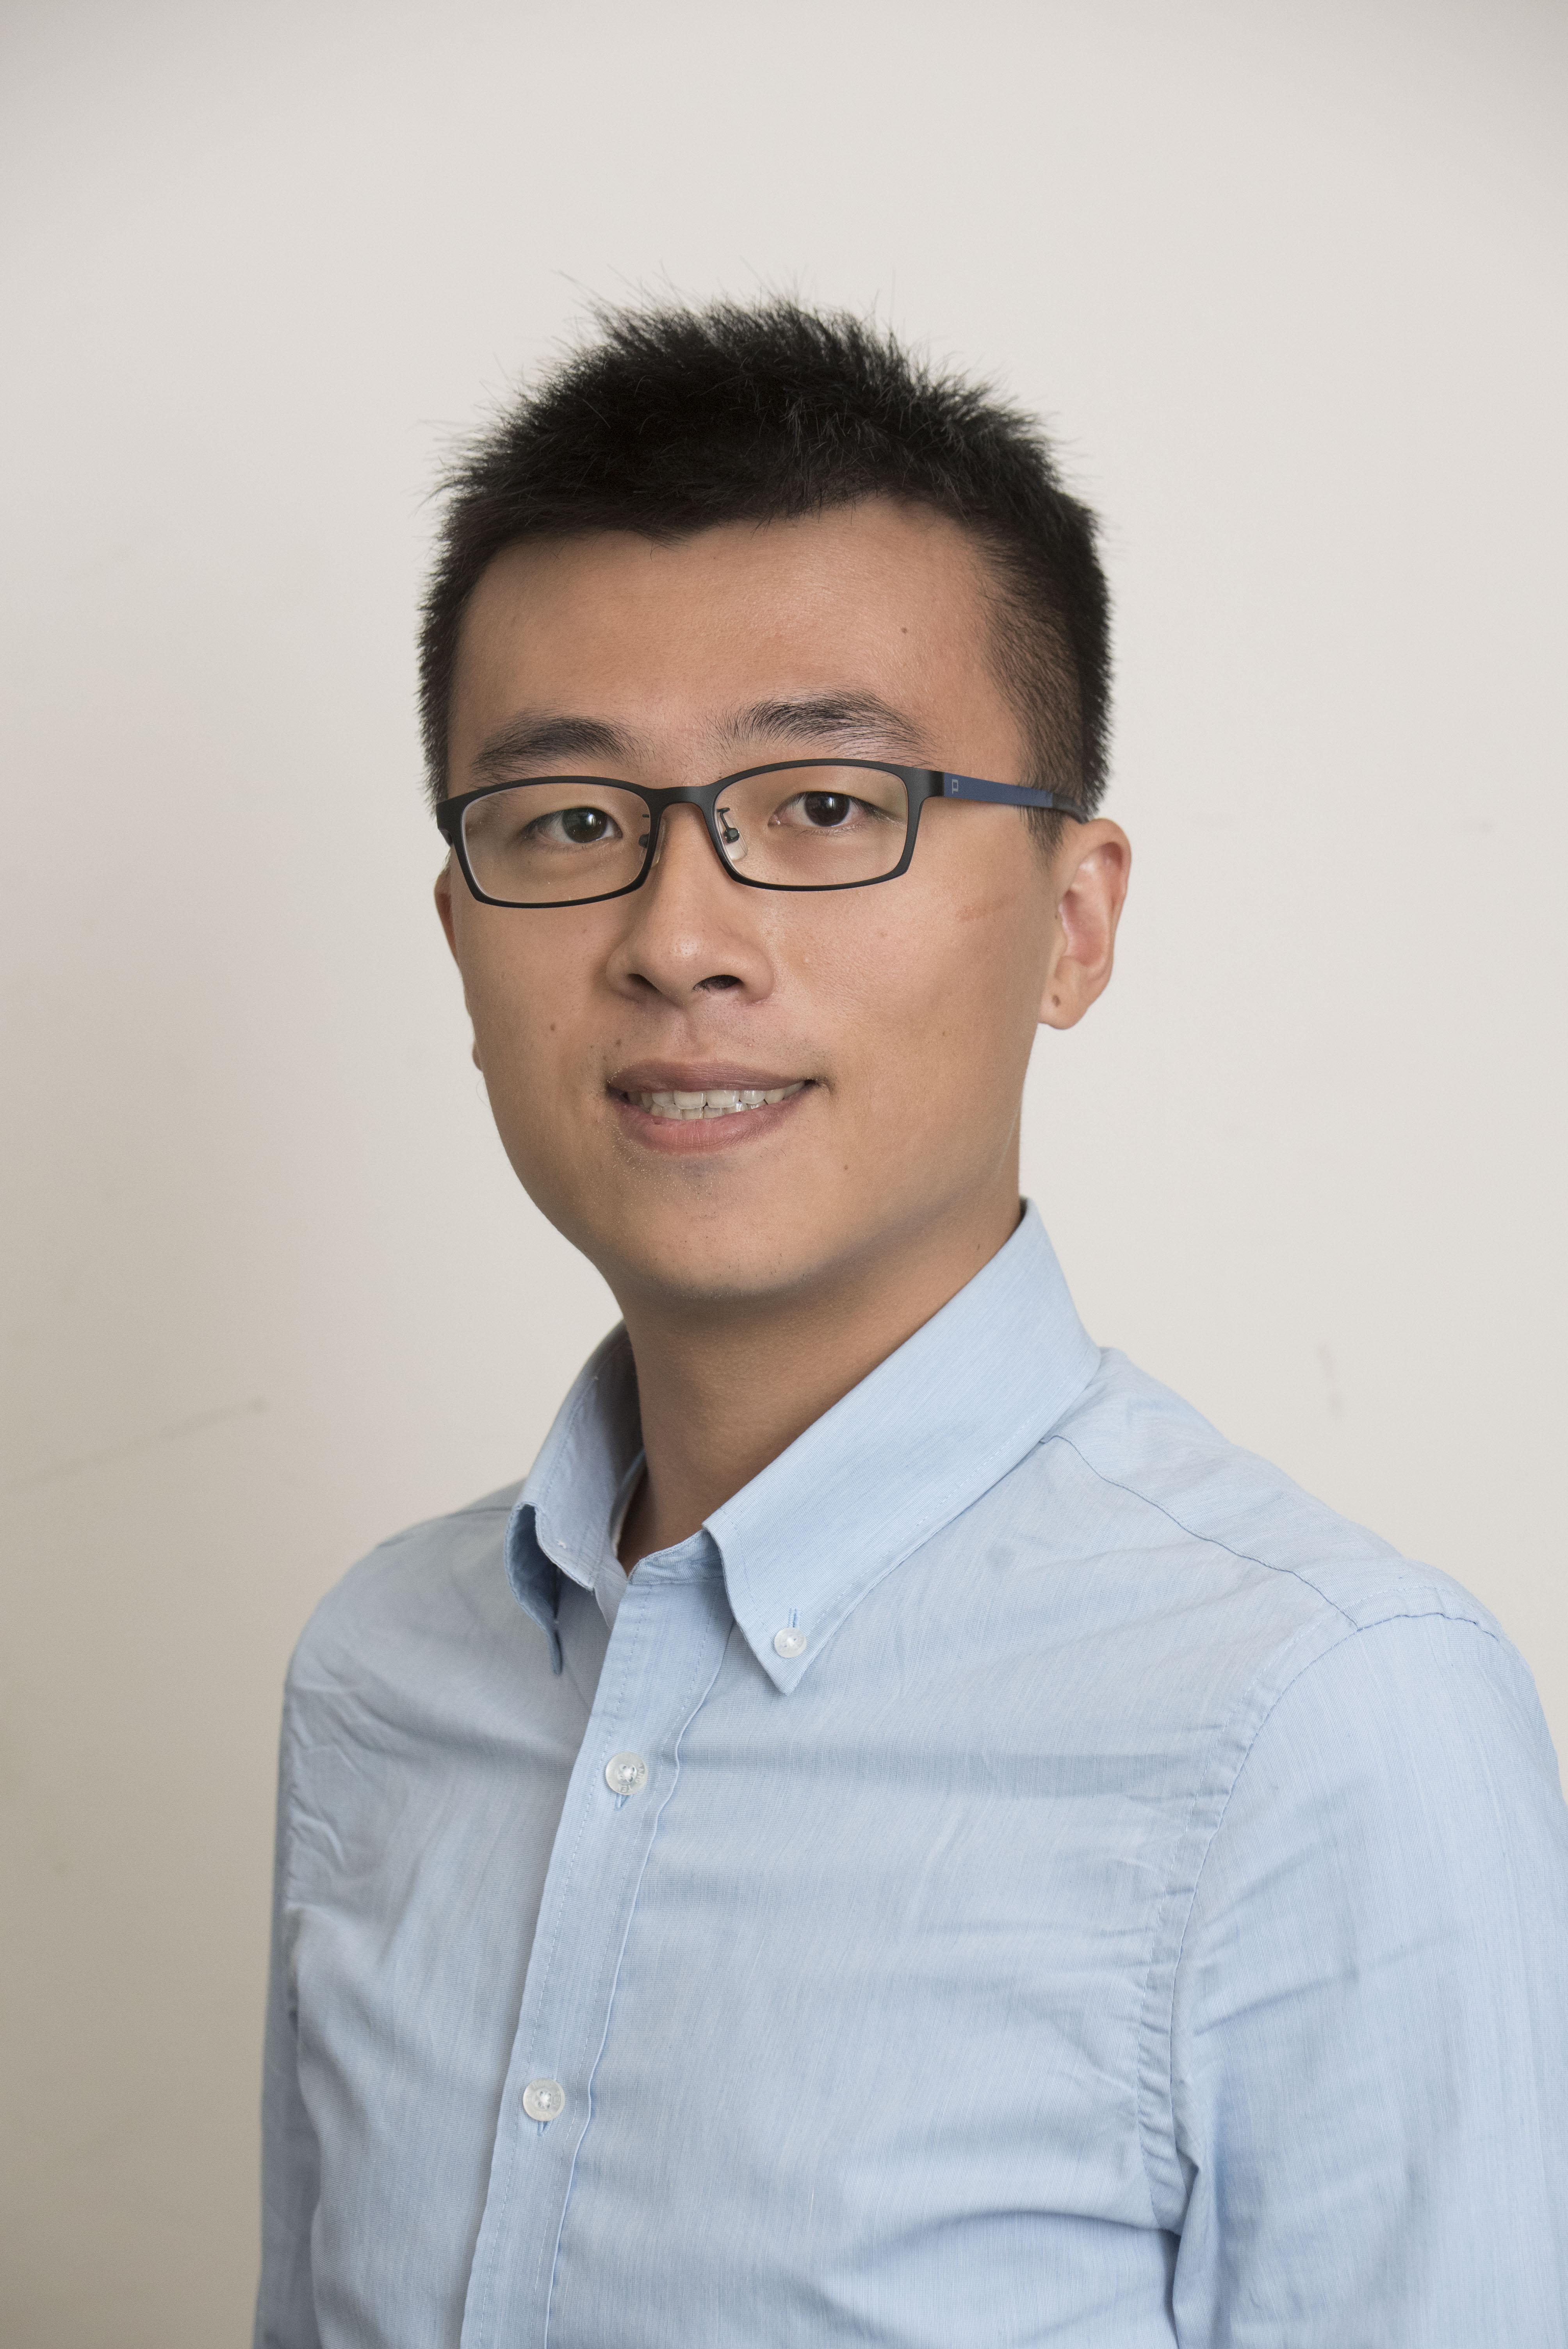 Headshot of Yuwen Chang